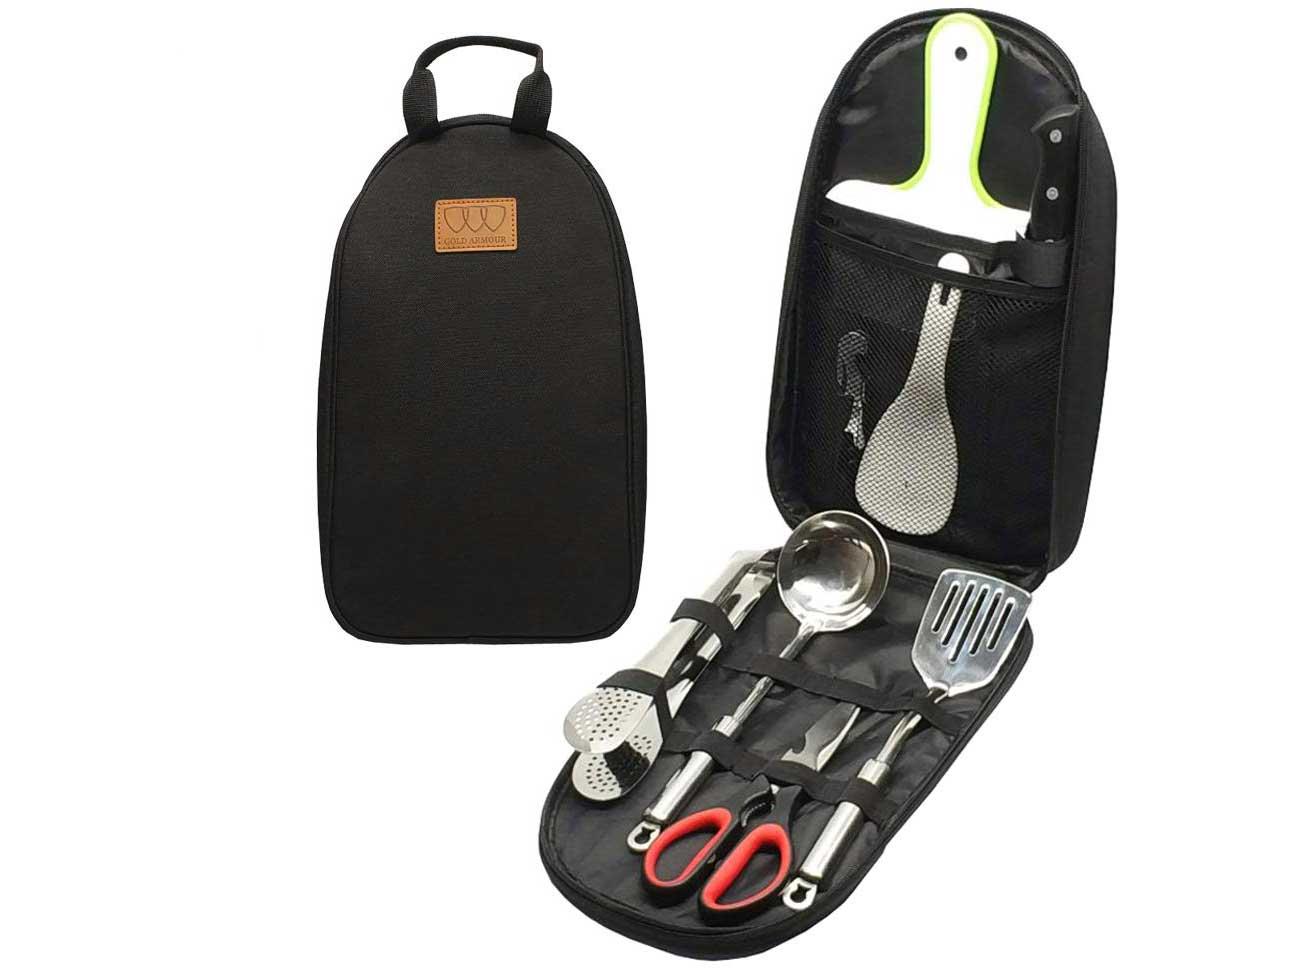 Camping Cookware Kitchen Utensil Organizer Travel Set